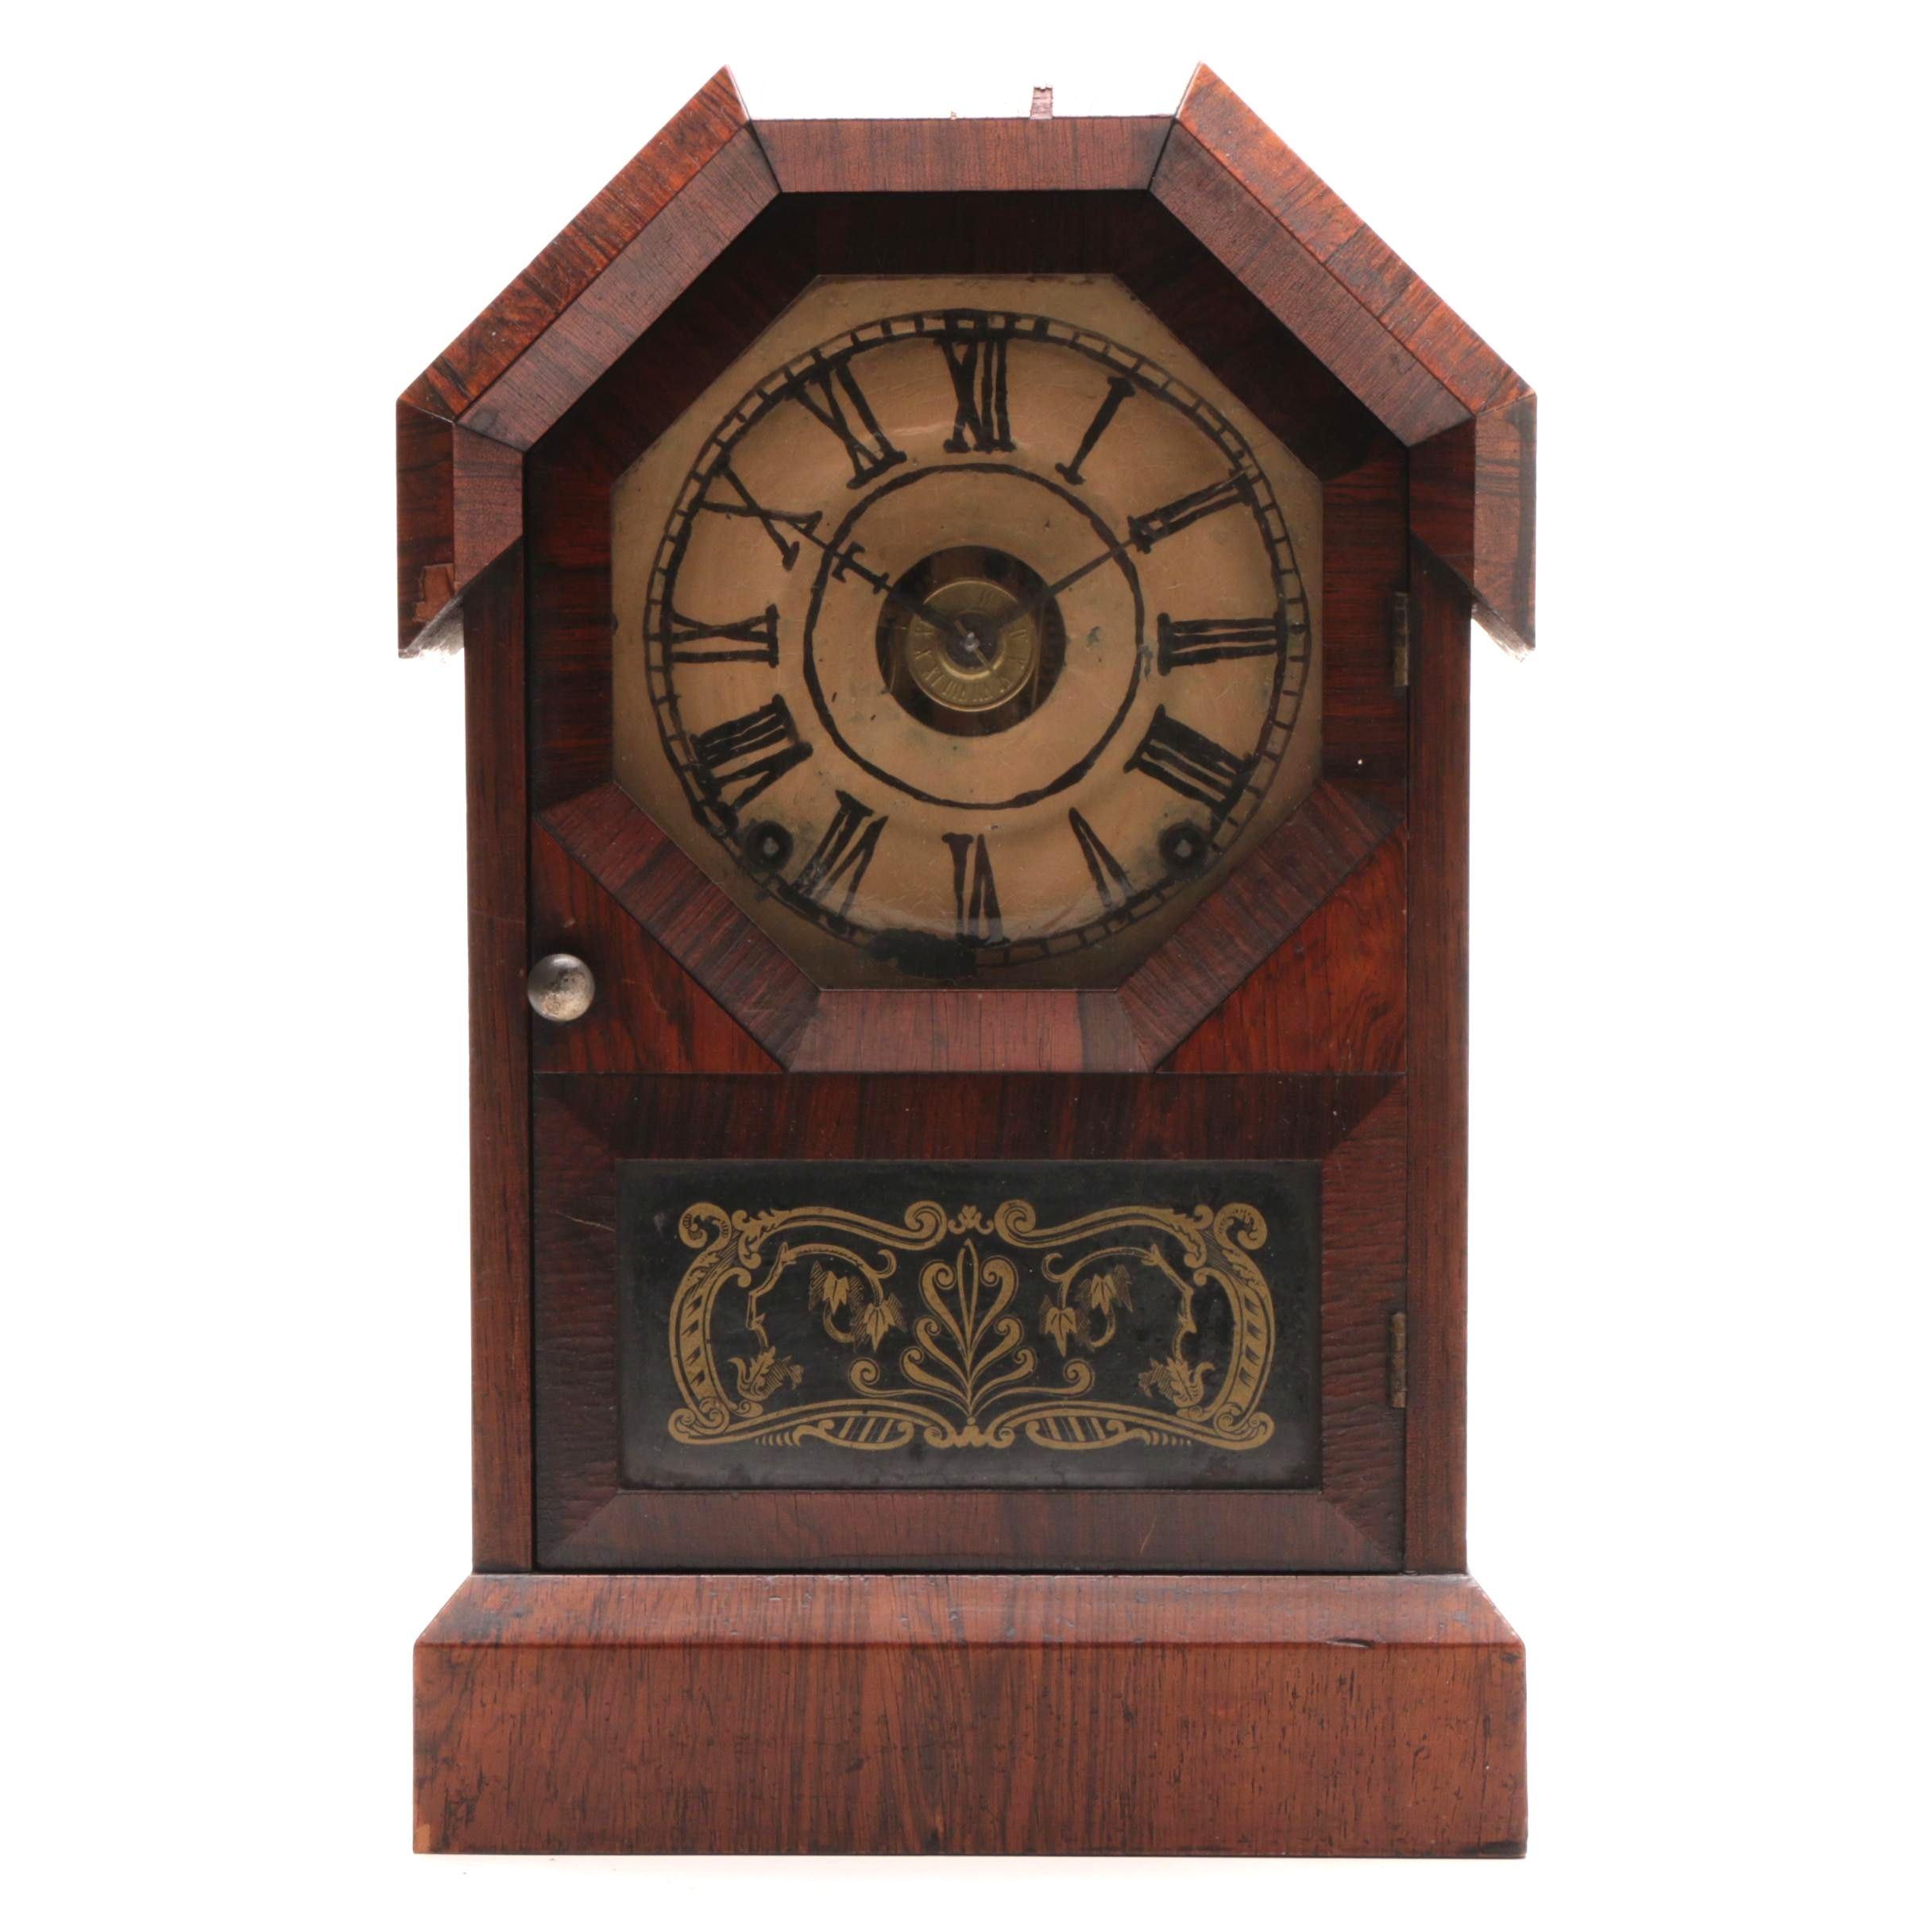 Antique Seth Thomas Octagon Top Mantel Clock